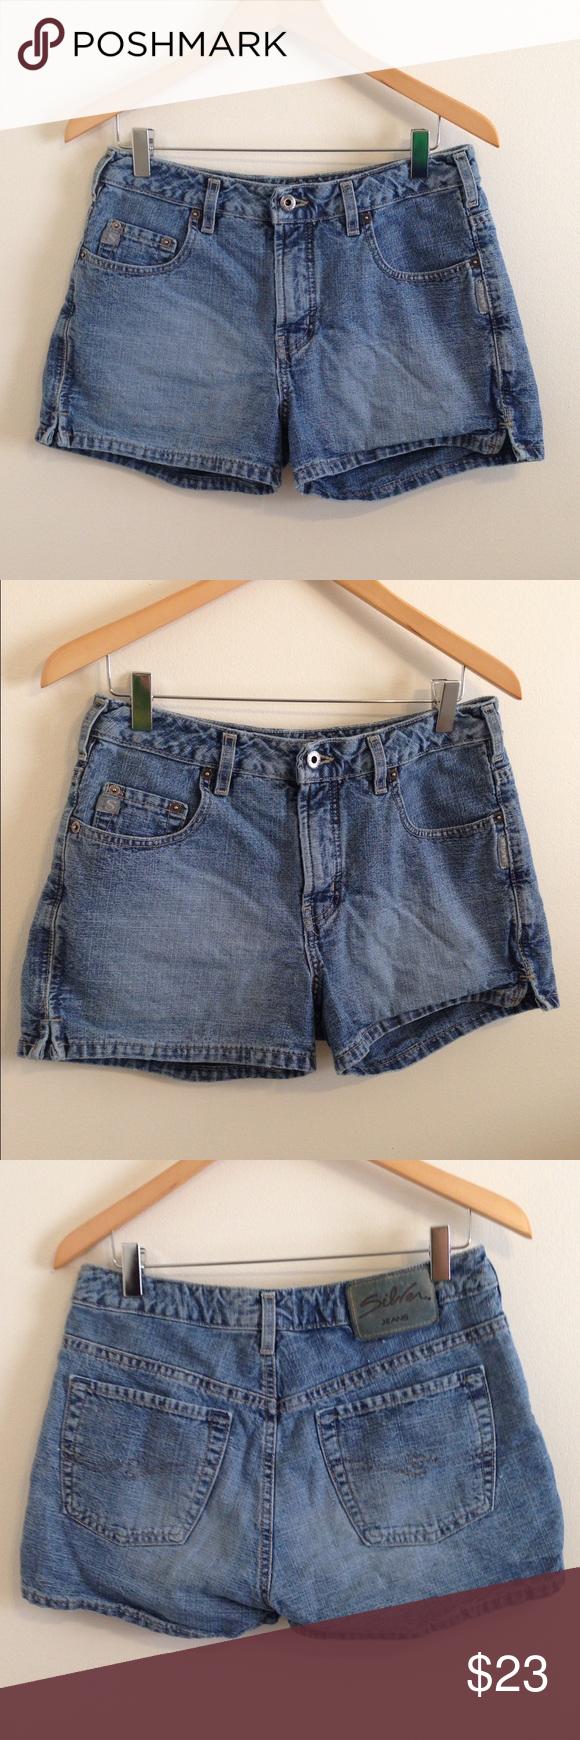 Silver Jeans denim shorts Silver Jeans denim shorts size 31. Silver Jeans Shorts Jean Shorts